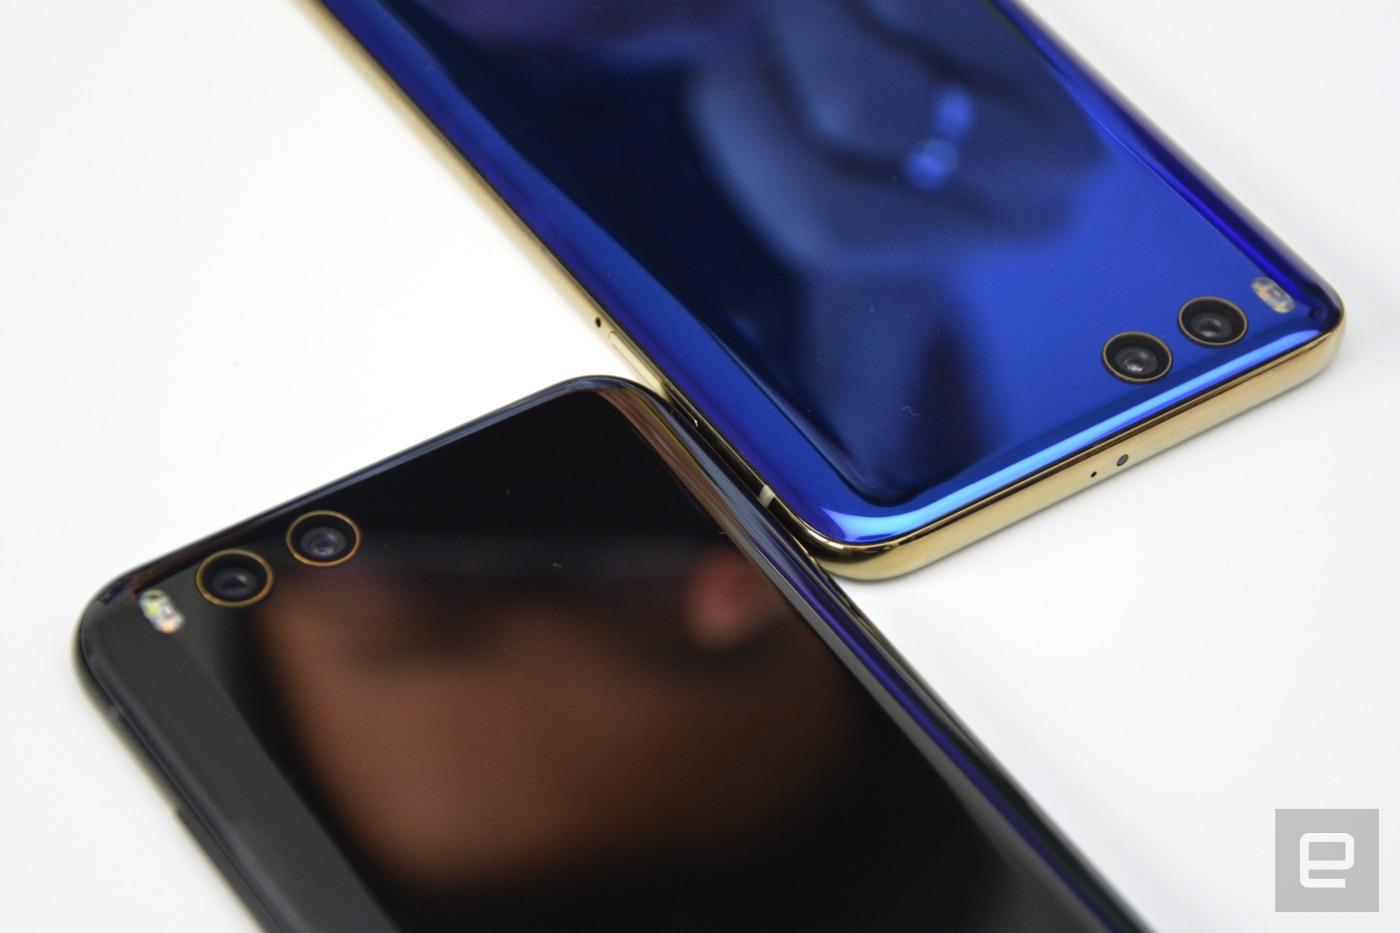 Xiaomi mi 6 mobile price in bangladesh xiaomi mi 6 stopboris Image collections